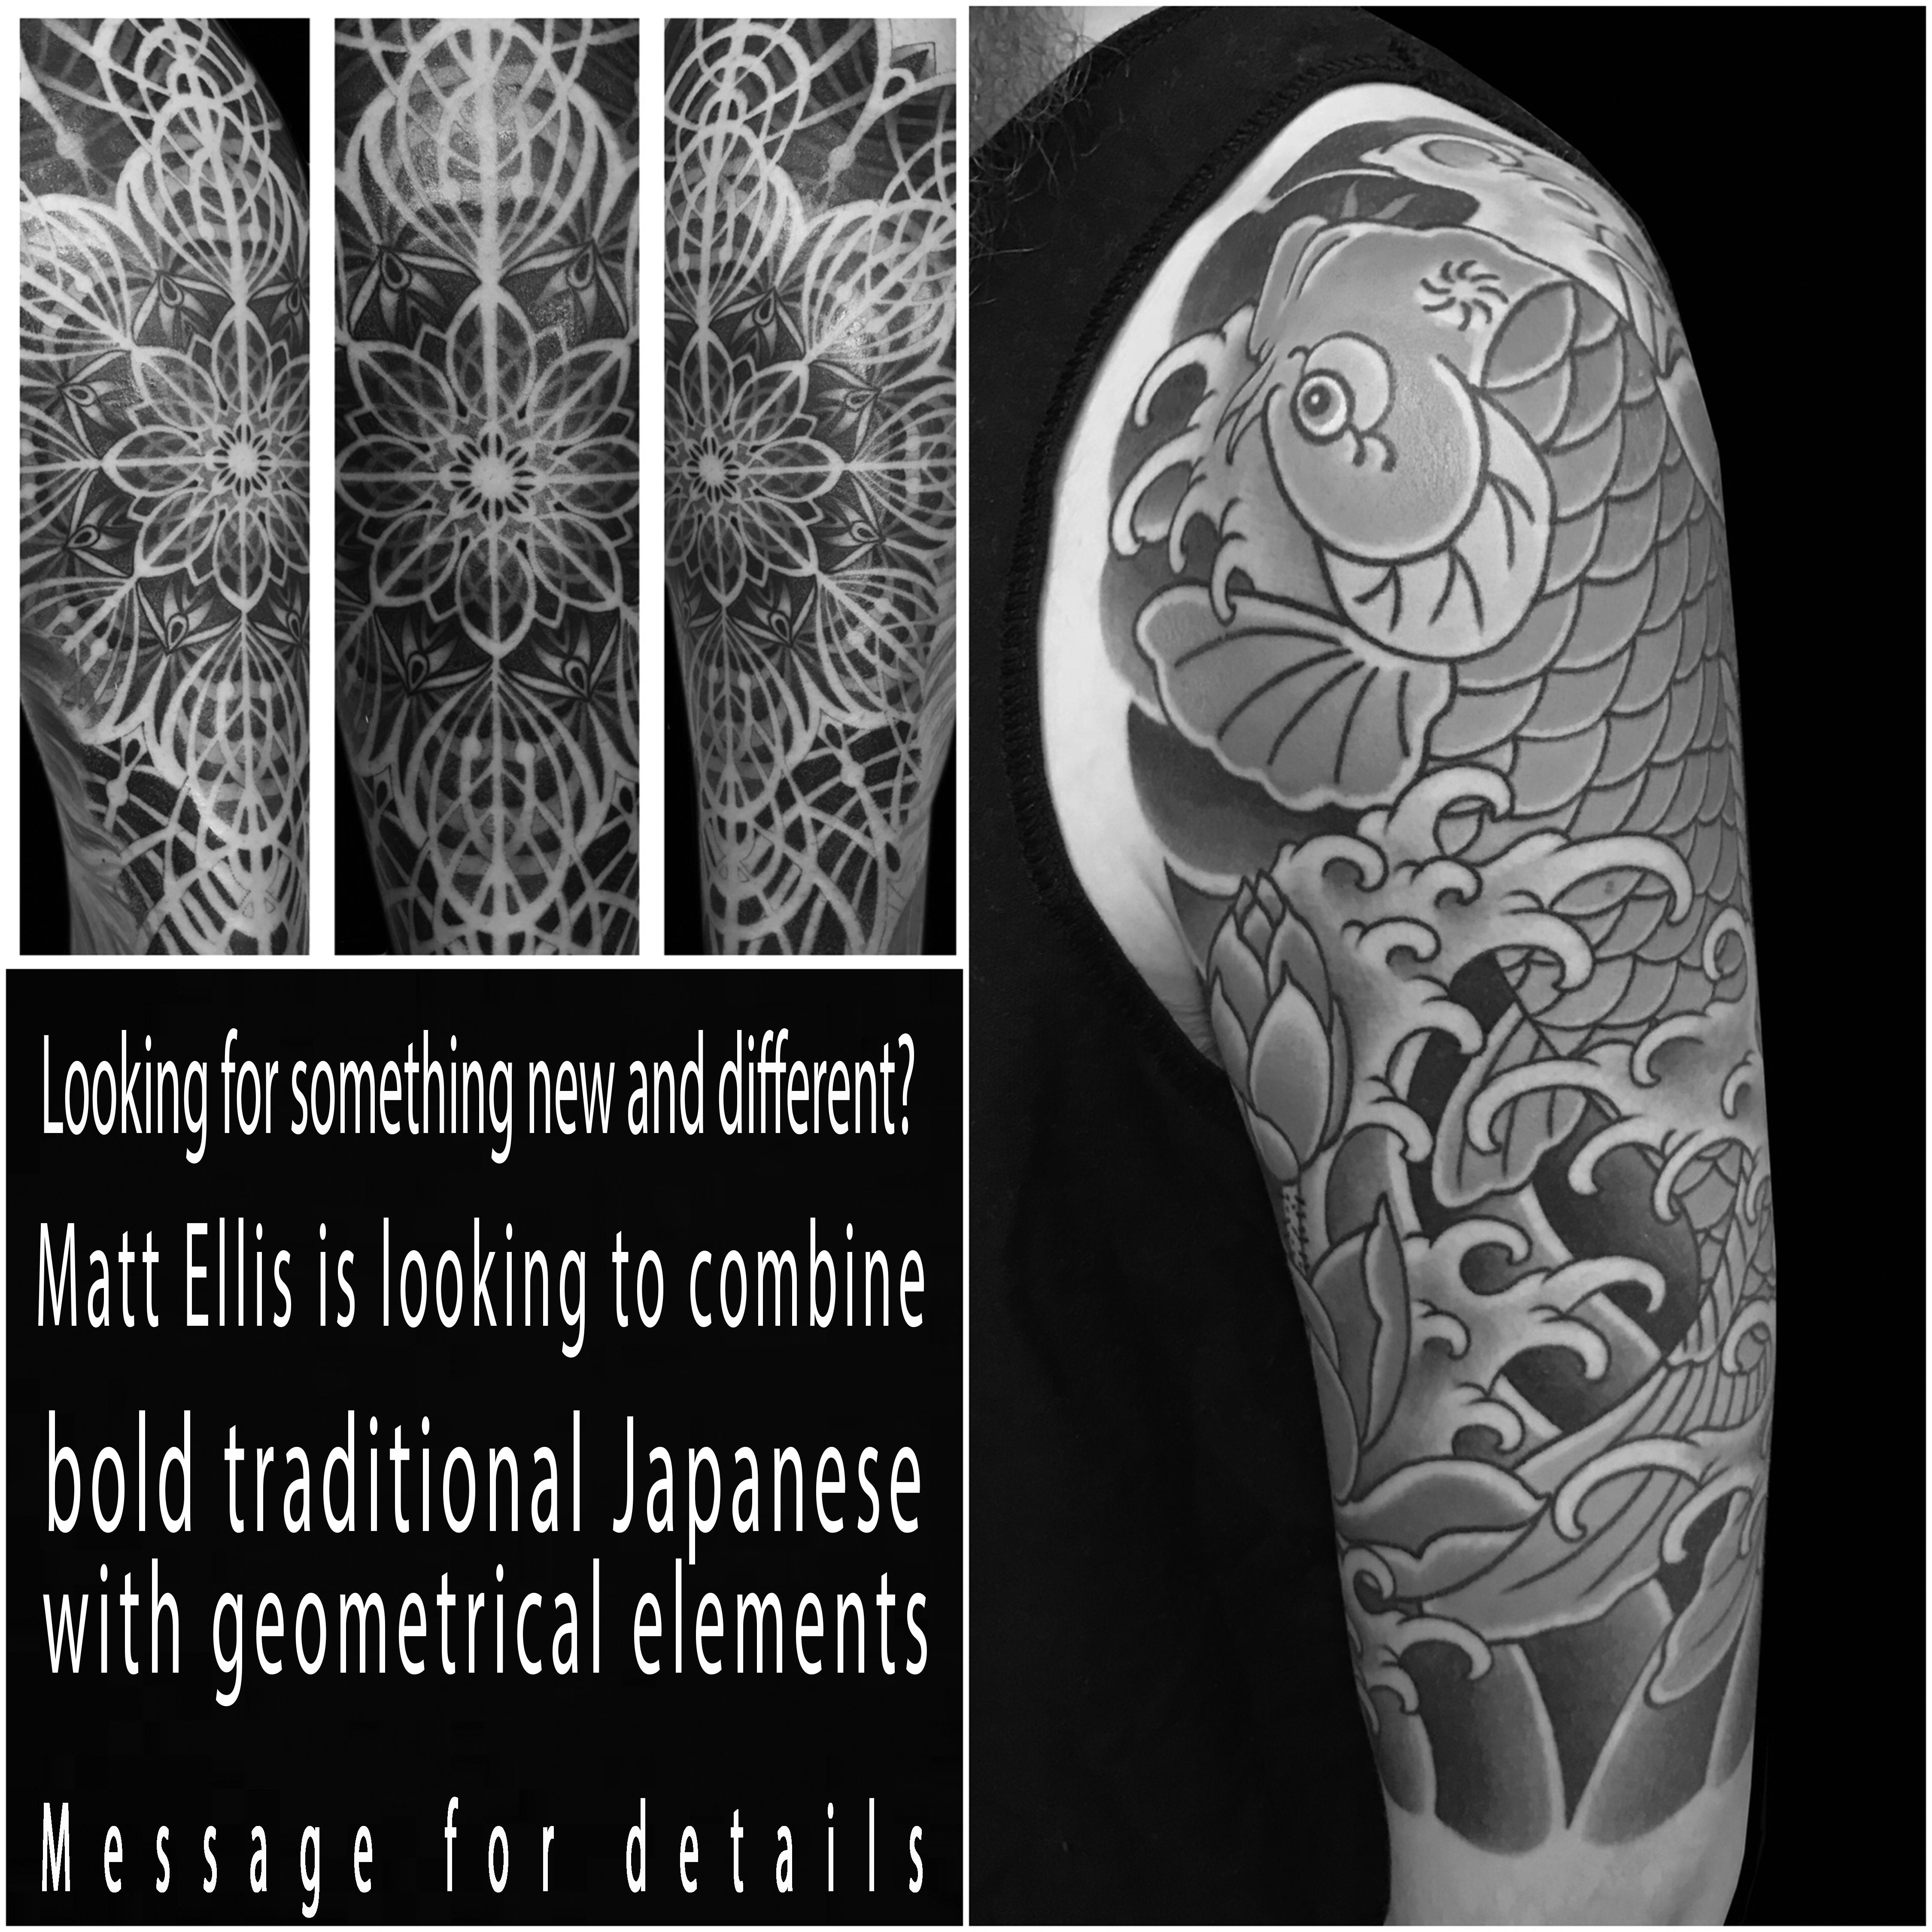 #Japanese #Japanesetattoo #traditionalJapanese #traditionalJapanesetattoo #geometrical #geometricaltattoo #tattoo #tattoos #tat #tats #tatts #tatted #tattedup #tattoist #tattooed #inked #inkedup #ink #tattoooftheday #amazingink #bodyart #tattooig #tattoosofinstagram #instatats #larktattoo #larktattoos #larktattoowestbury #westbury #longisland #NY #NewYork #usa #art #matt #ellis #mattellis #mattcellis